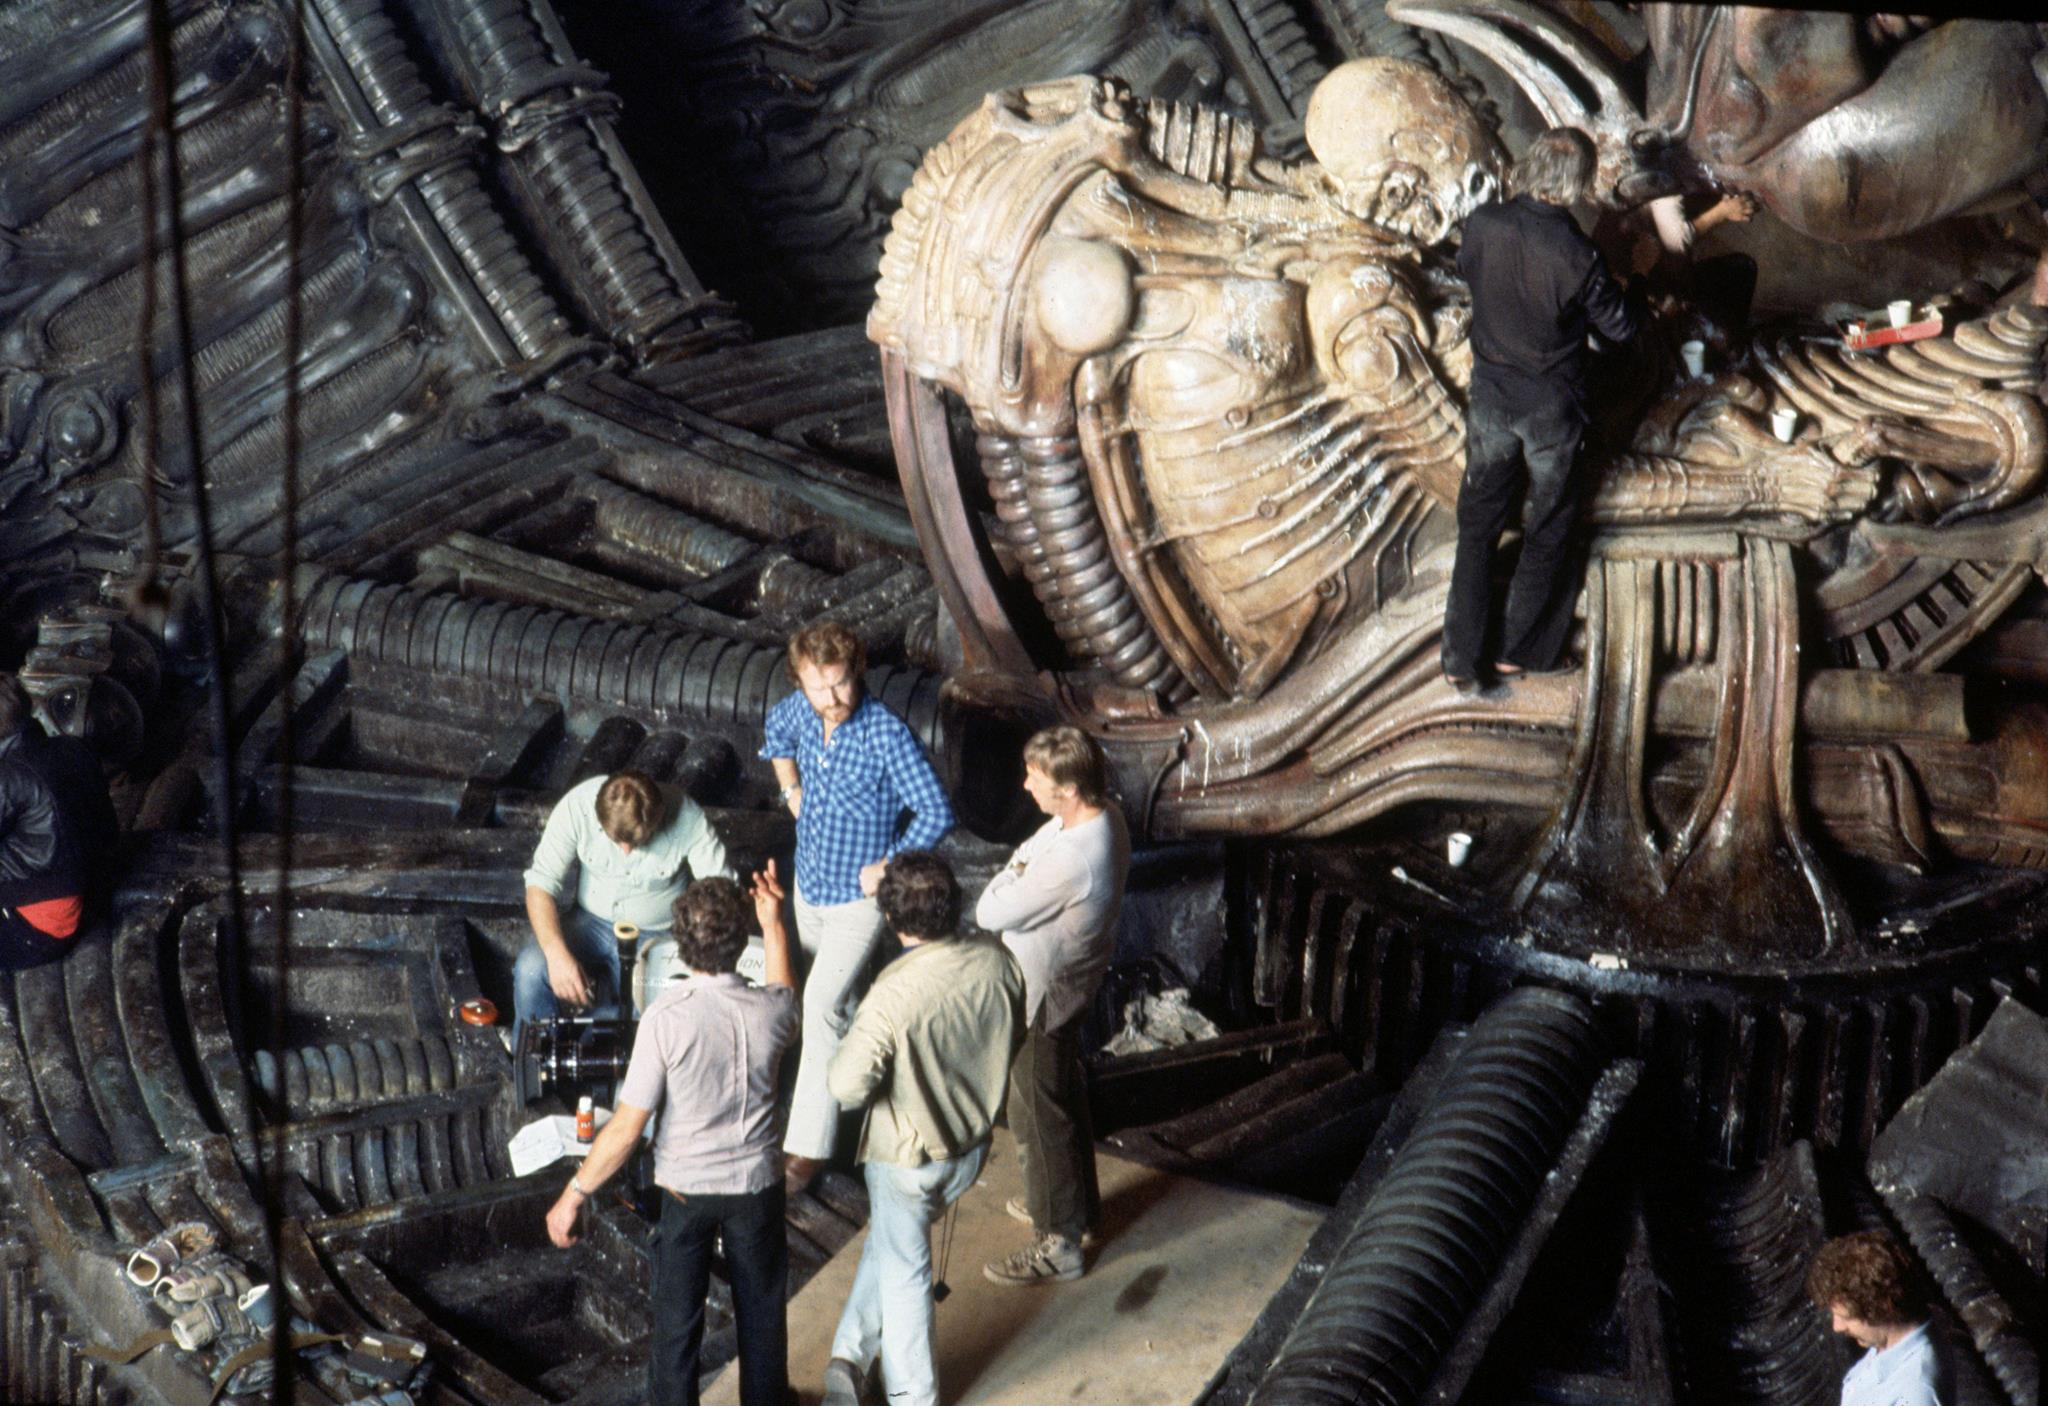 40 Years of Hurt, Face-Hugging Dreams of Breathing: Ridley Scott's 'Alien'